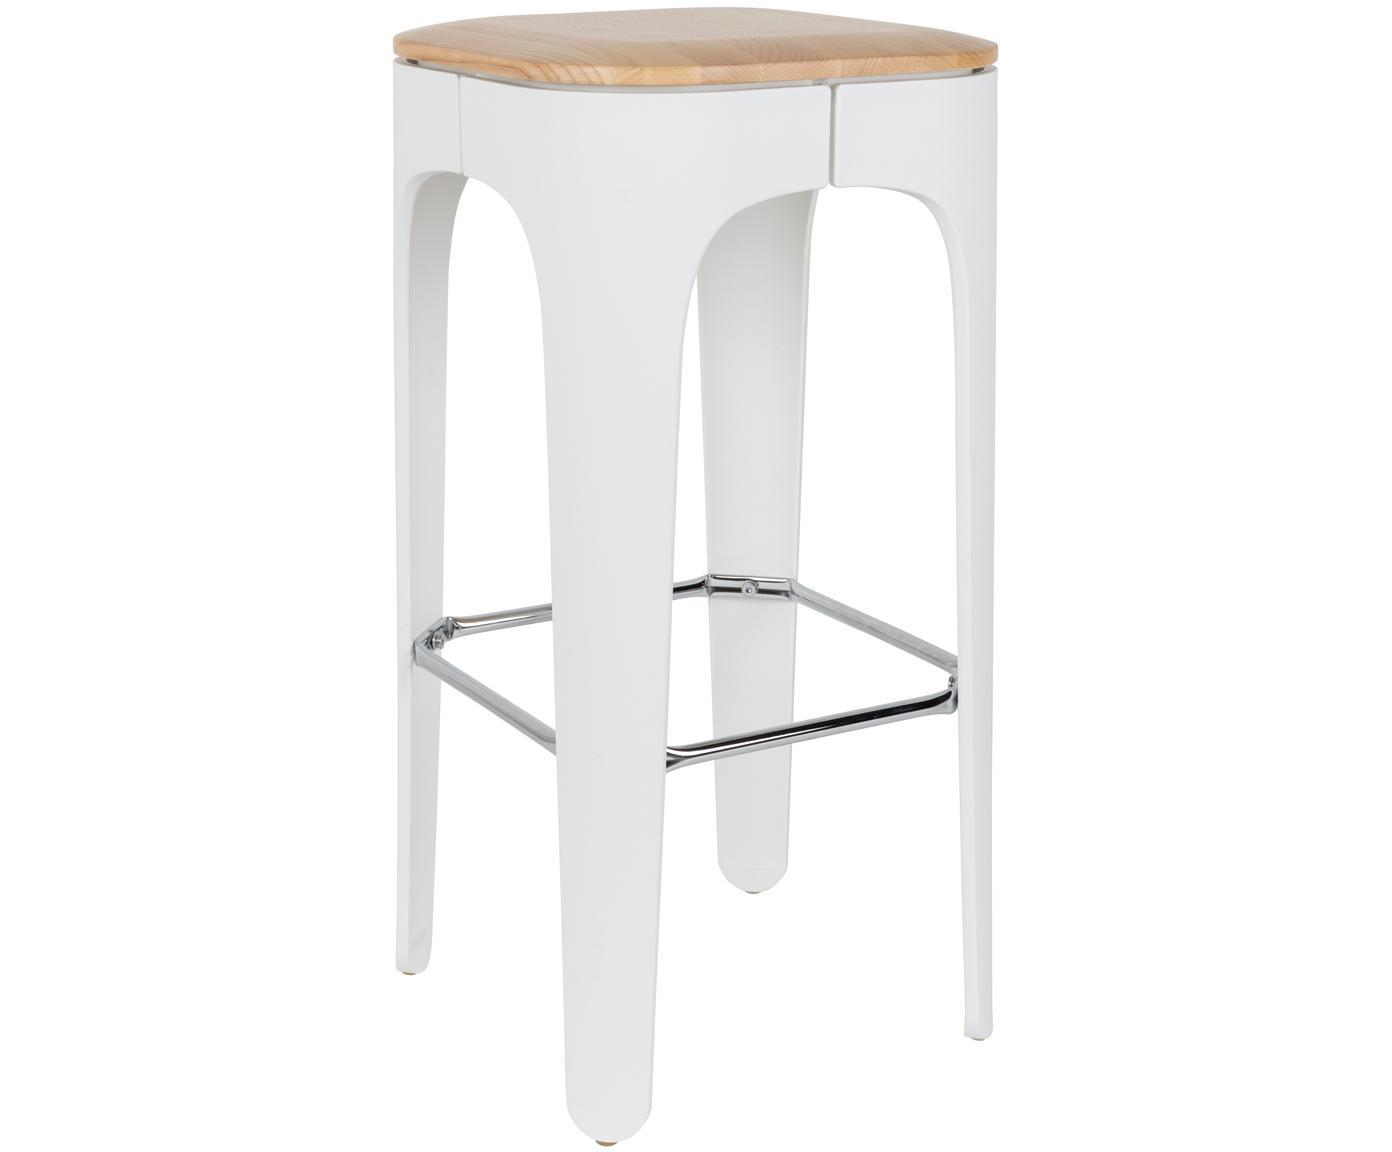 Sgabello da bar Up-High, Seduta: massello di frassino, Gambe: polipropilene, opaco vern, Seduta: legno di frassino >Gambe: bianco >Poggiapiedi: cromato, Larg. 35 x Alt. 73 cm